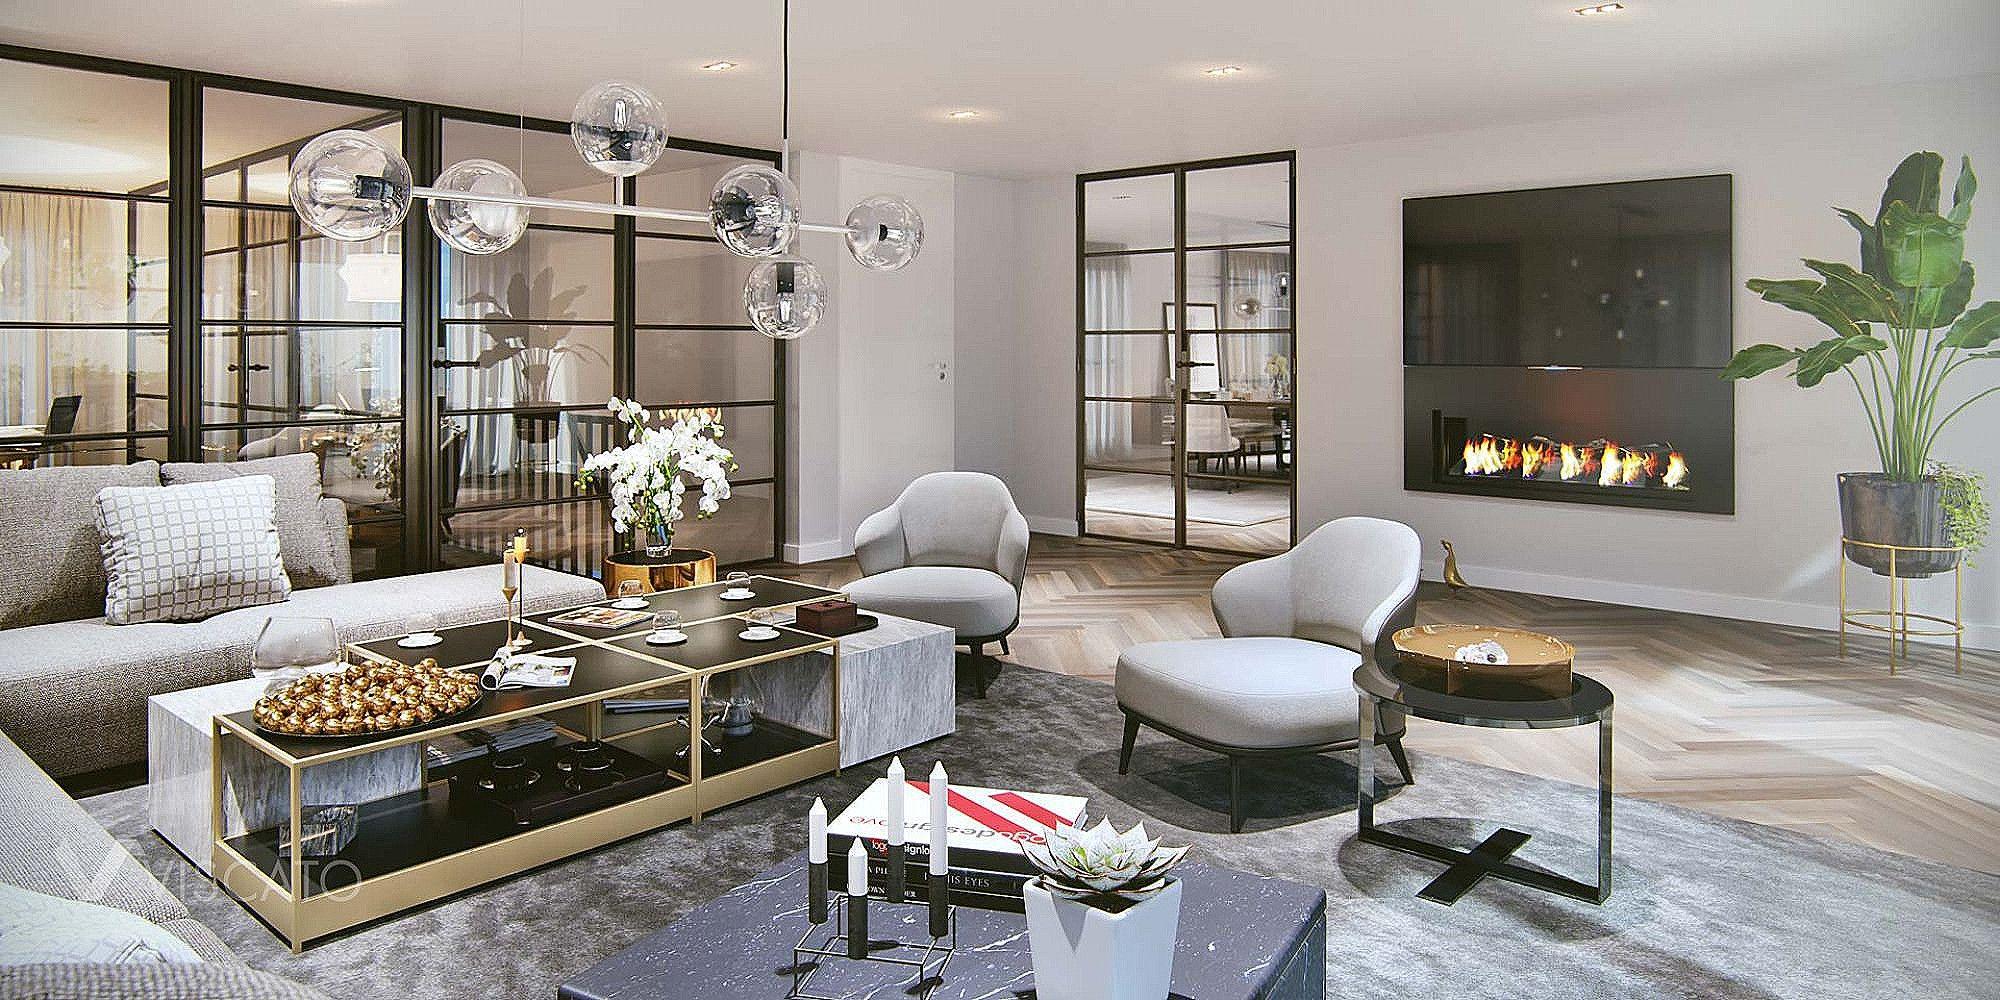 Luxury Big Living Room Interior Design Ideas - #bighouseliving